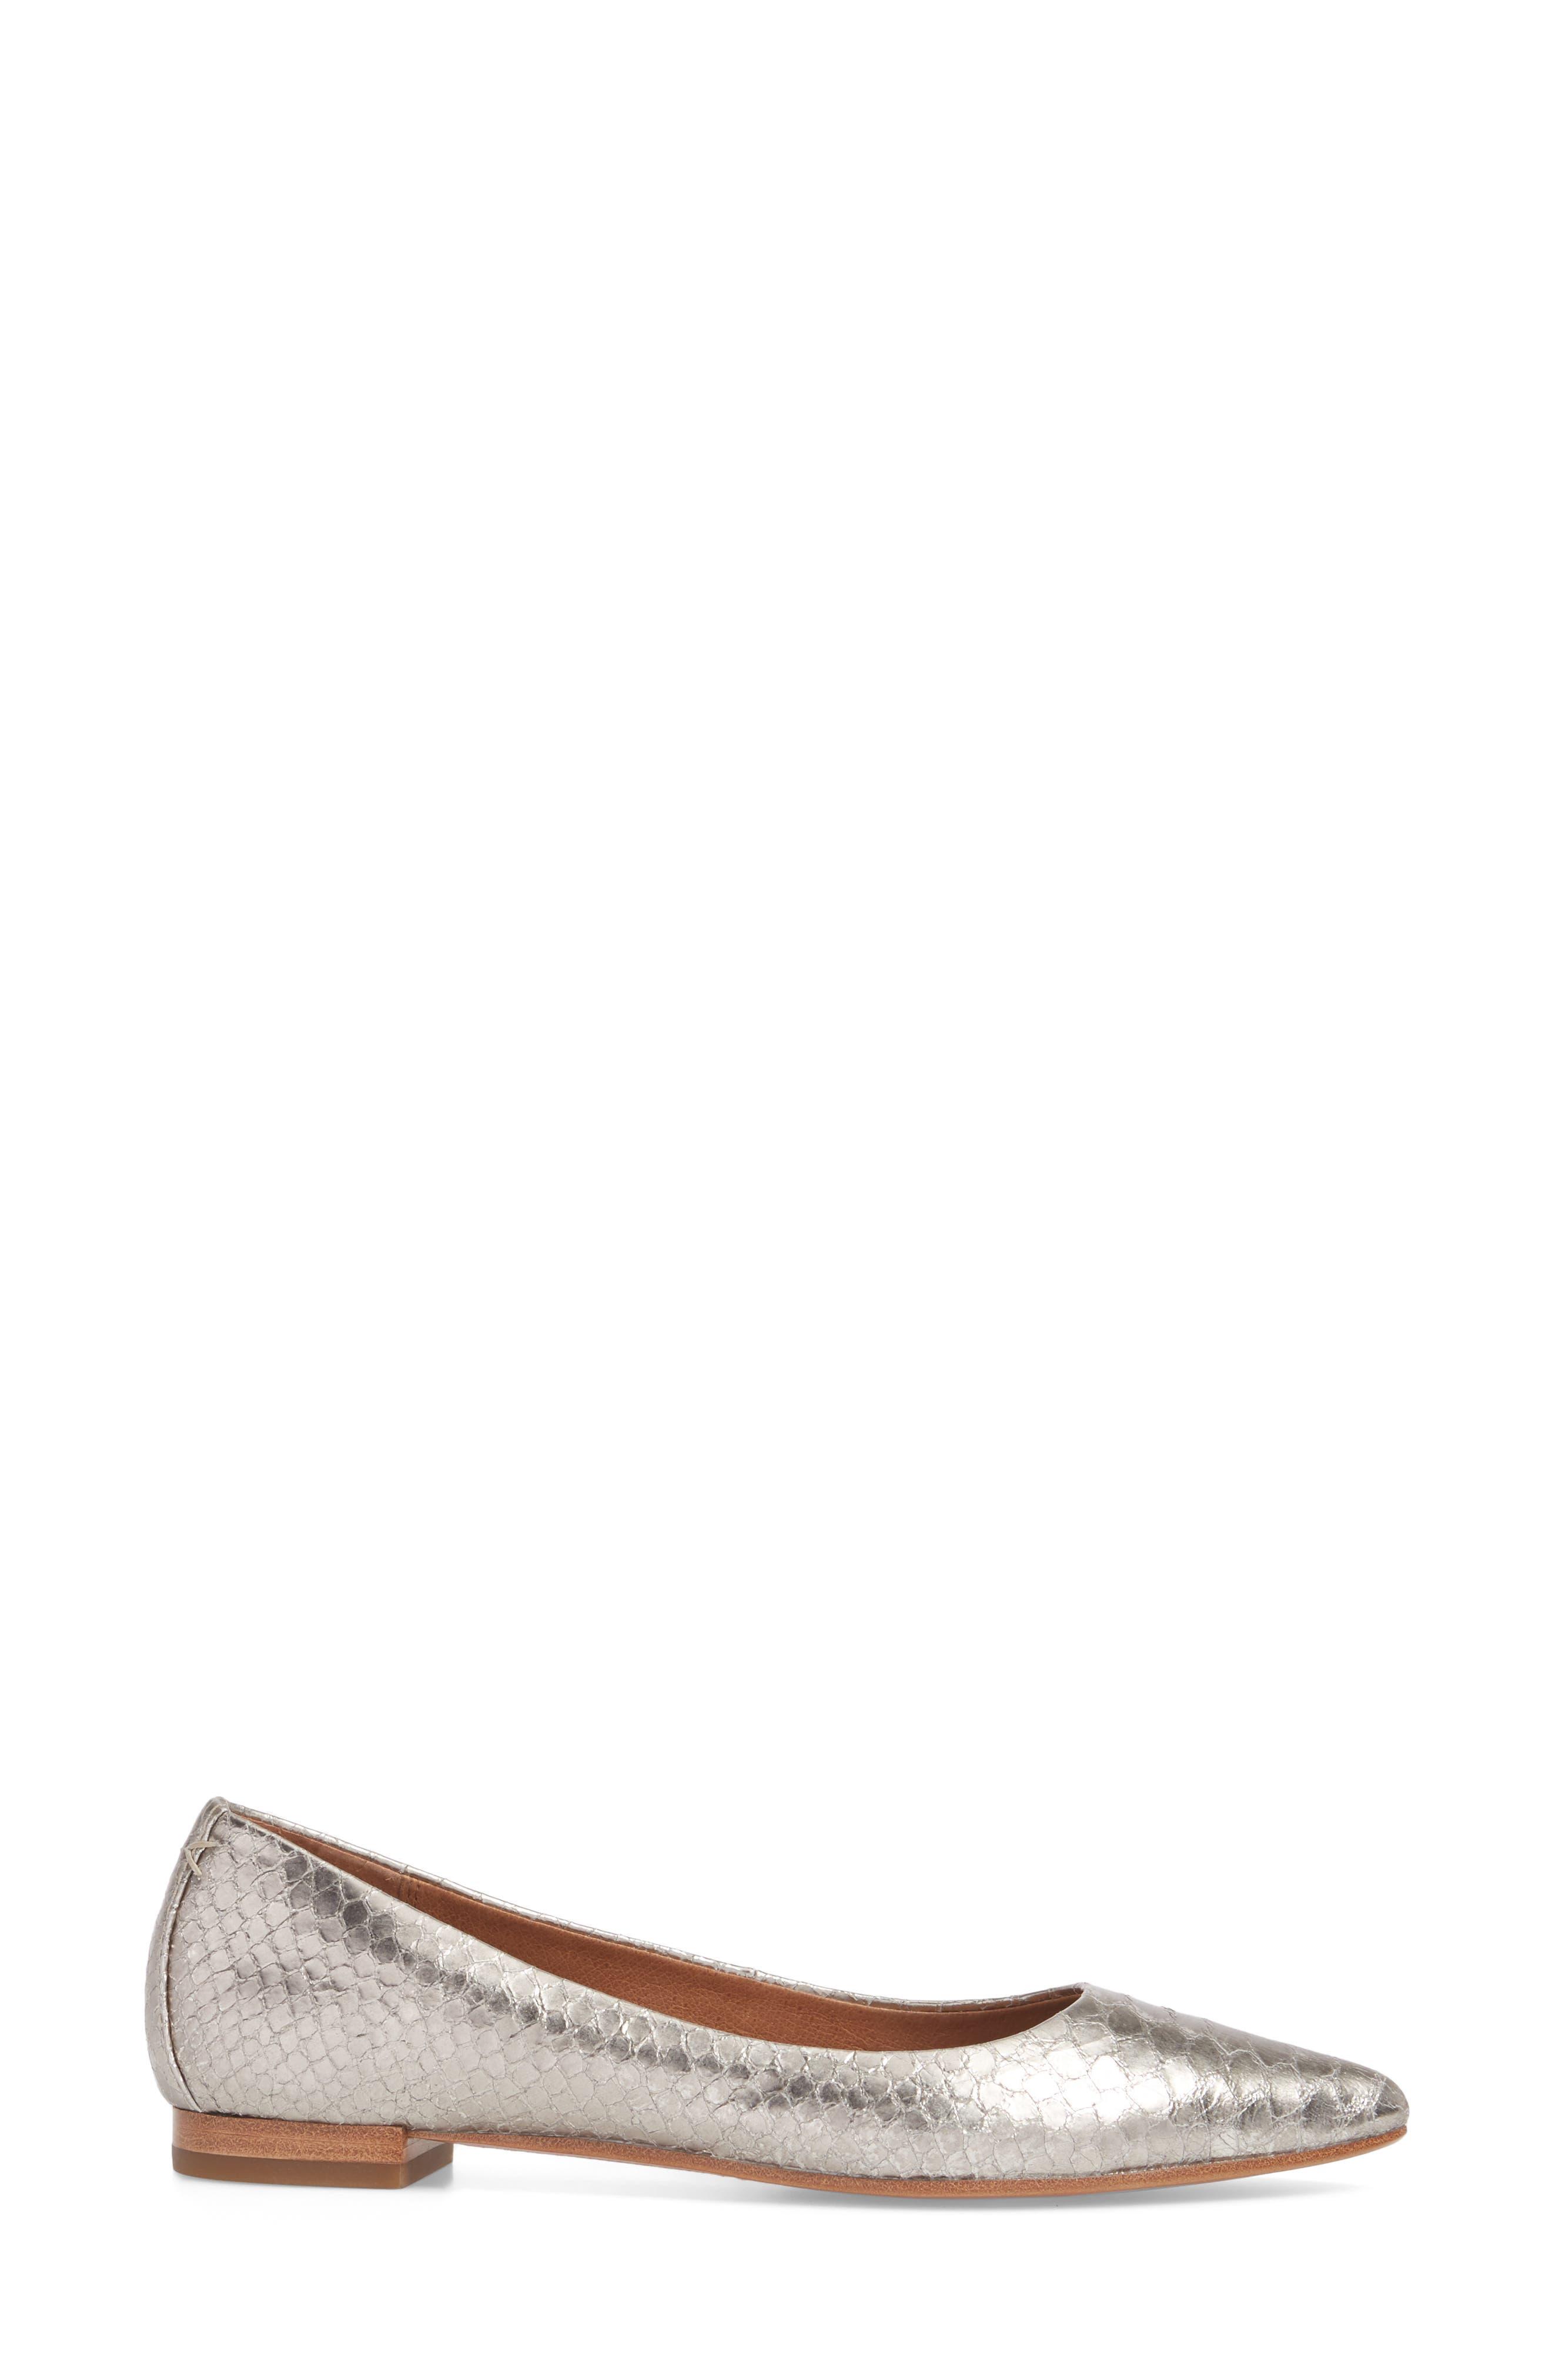 Sienna Pointy Toe Ballet Flat,                             Alternate thumbnail 3, color,                             040